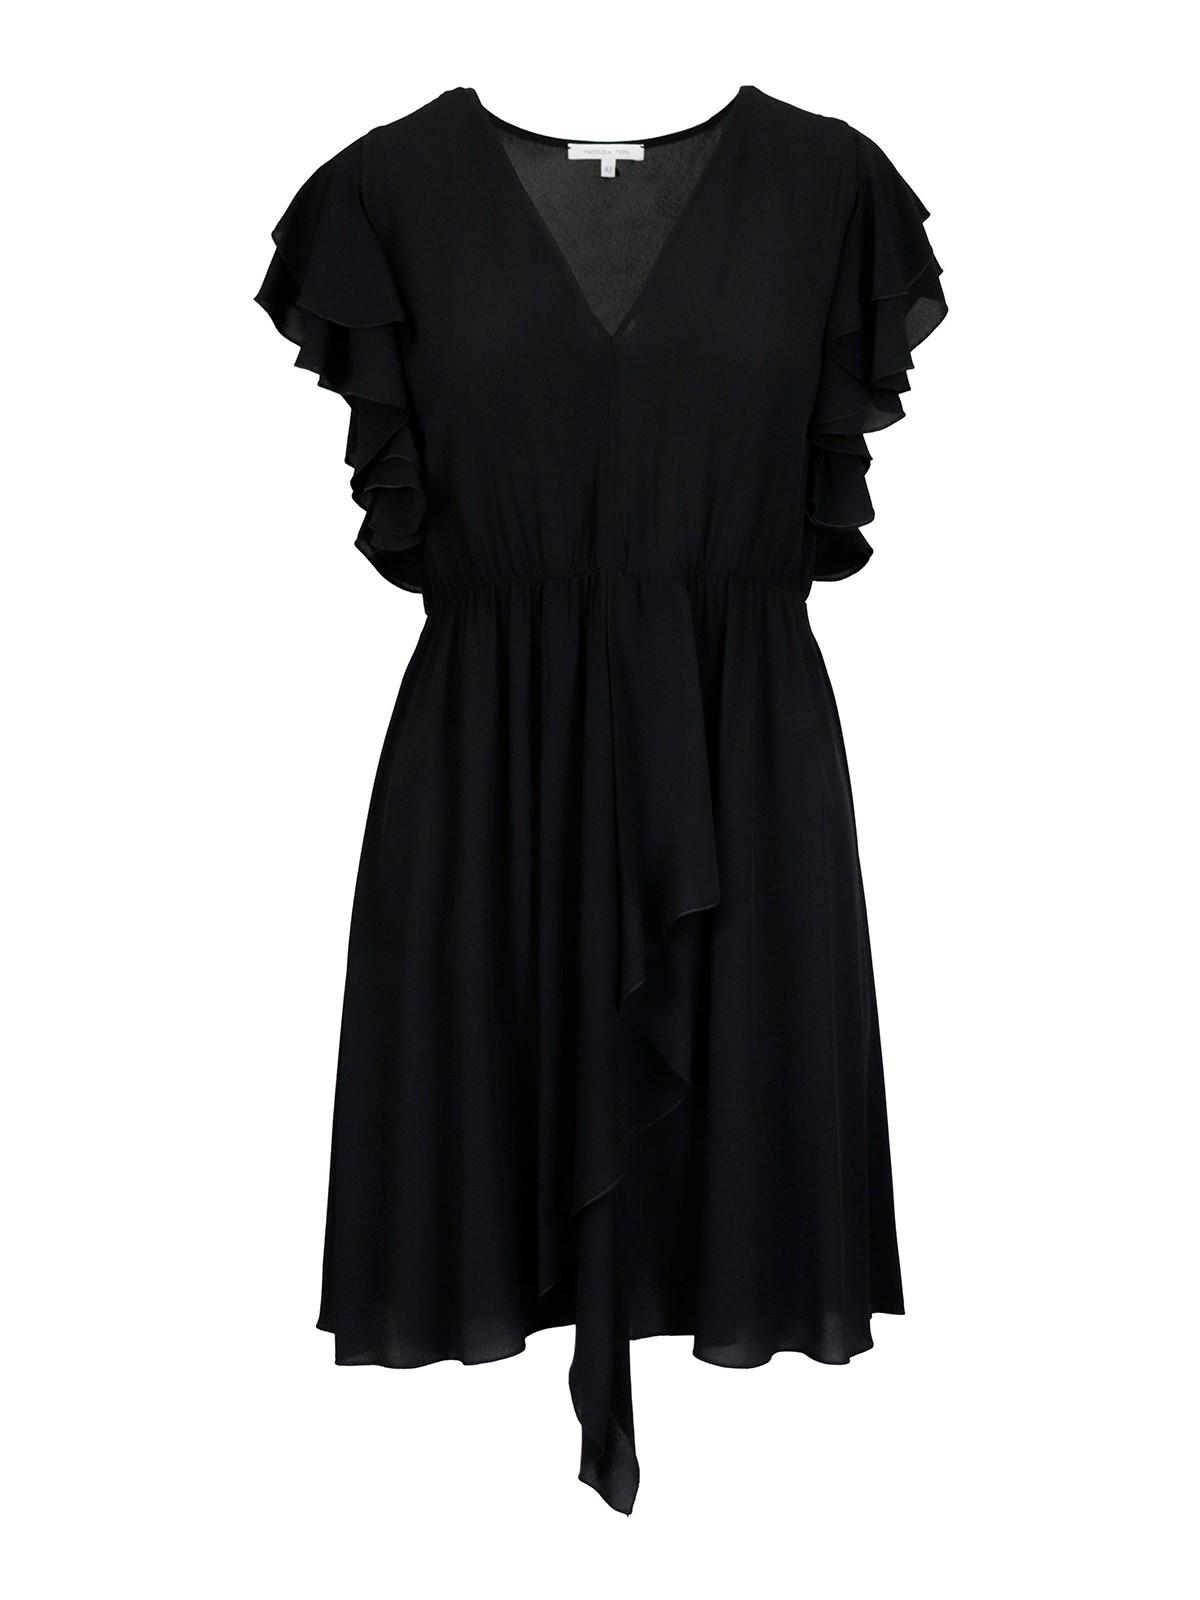 Patrizia Pepe CREPE LIGHT DRESS